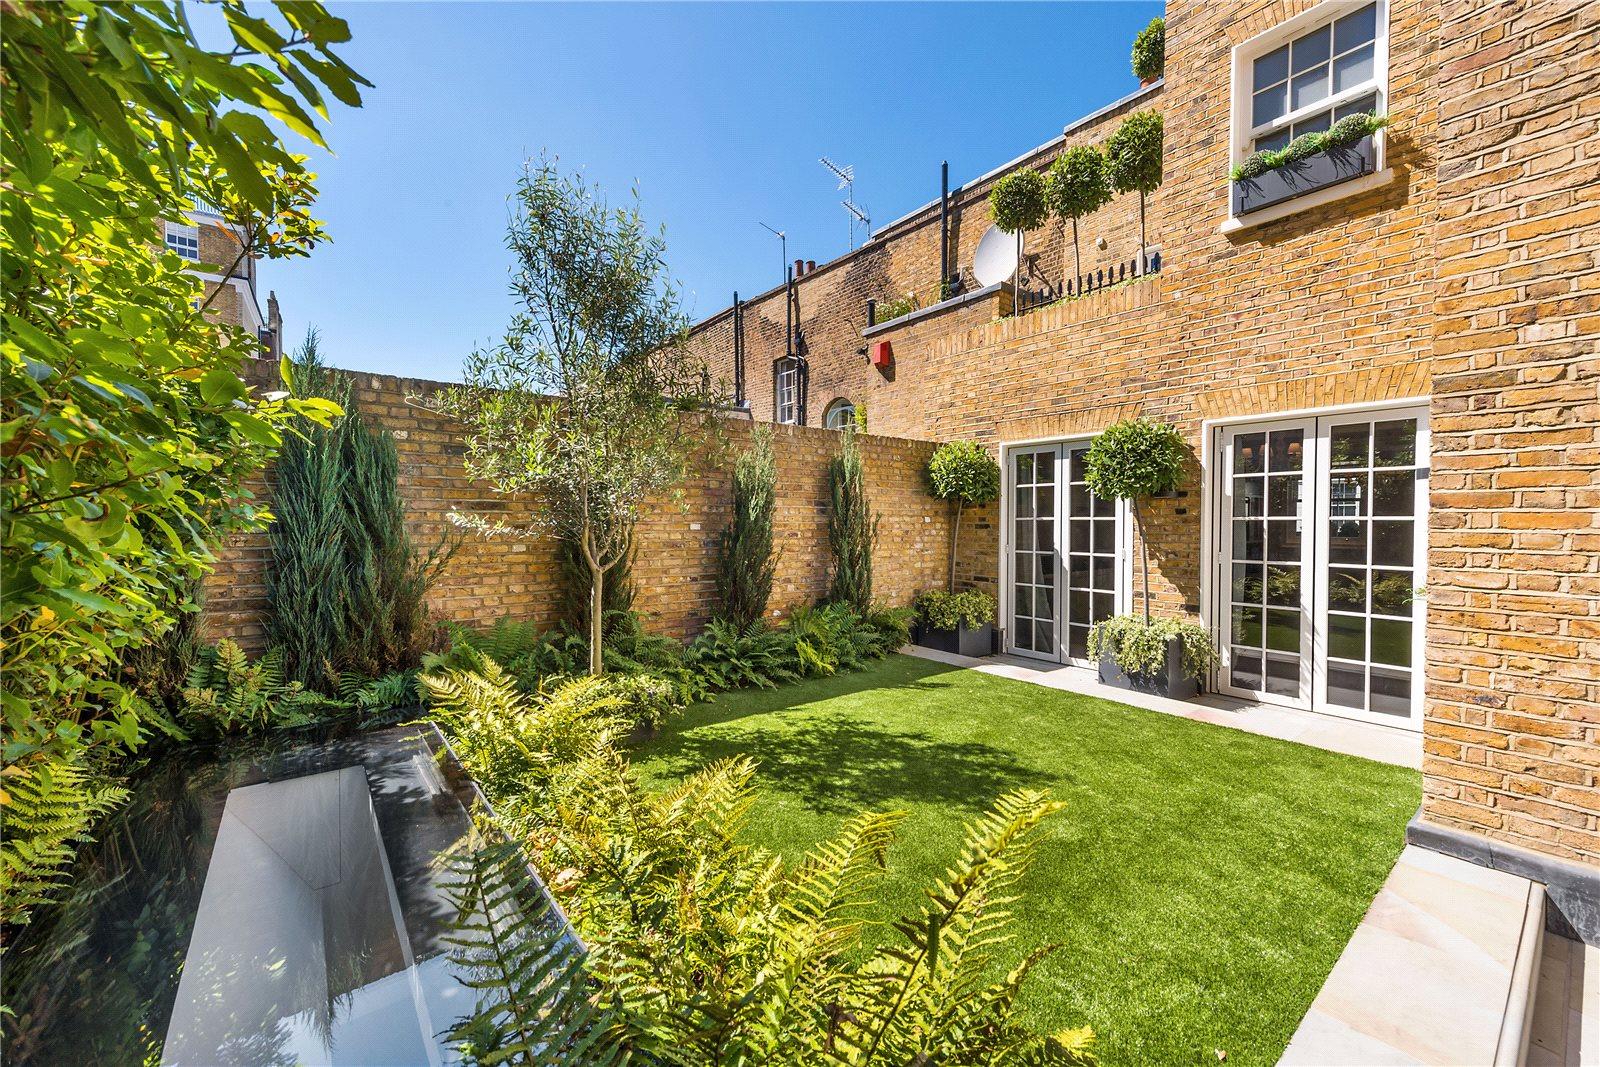 Single Family Home for Sale at Walton Street, London, SW3 London, England